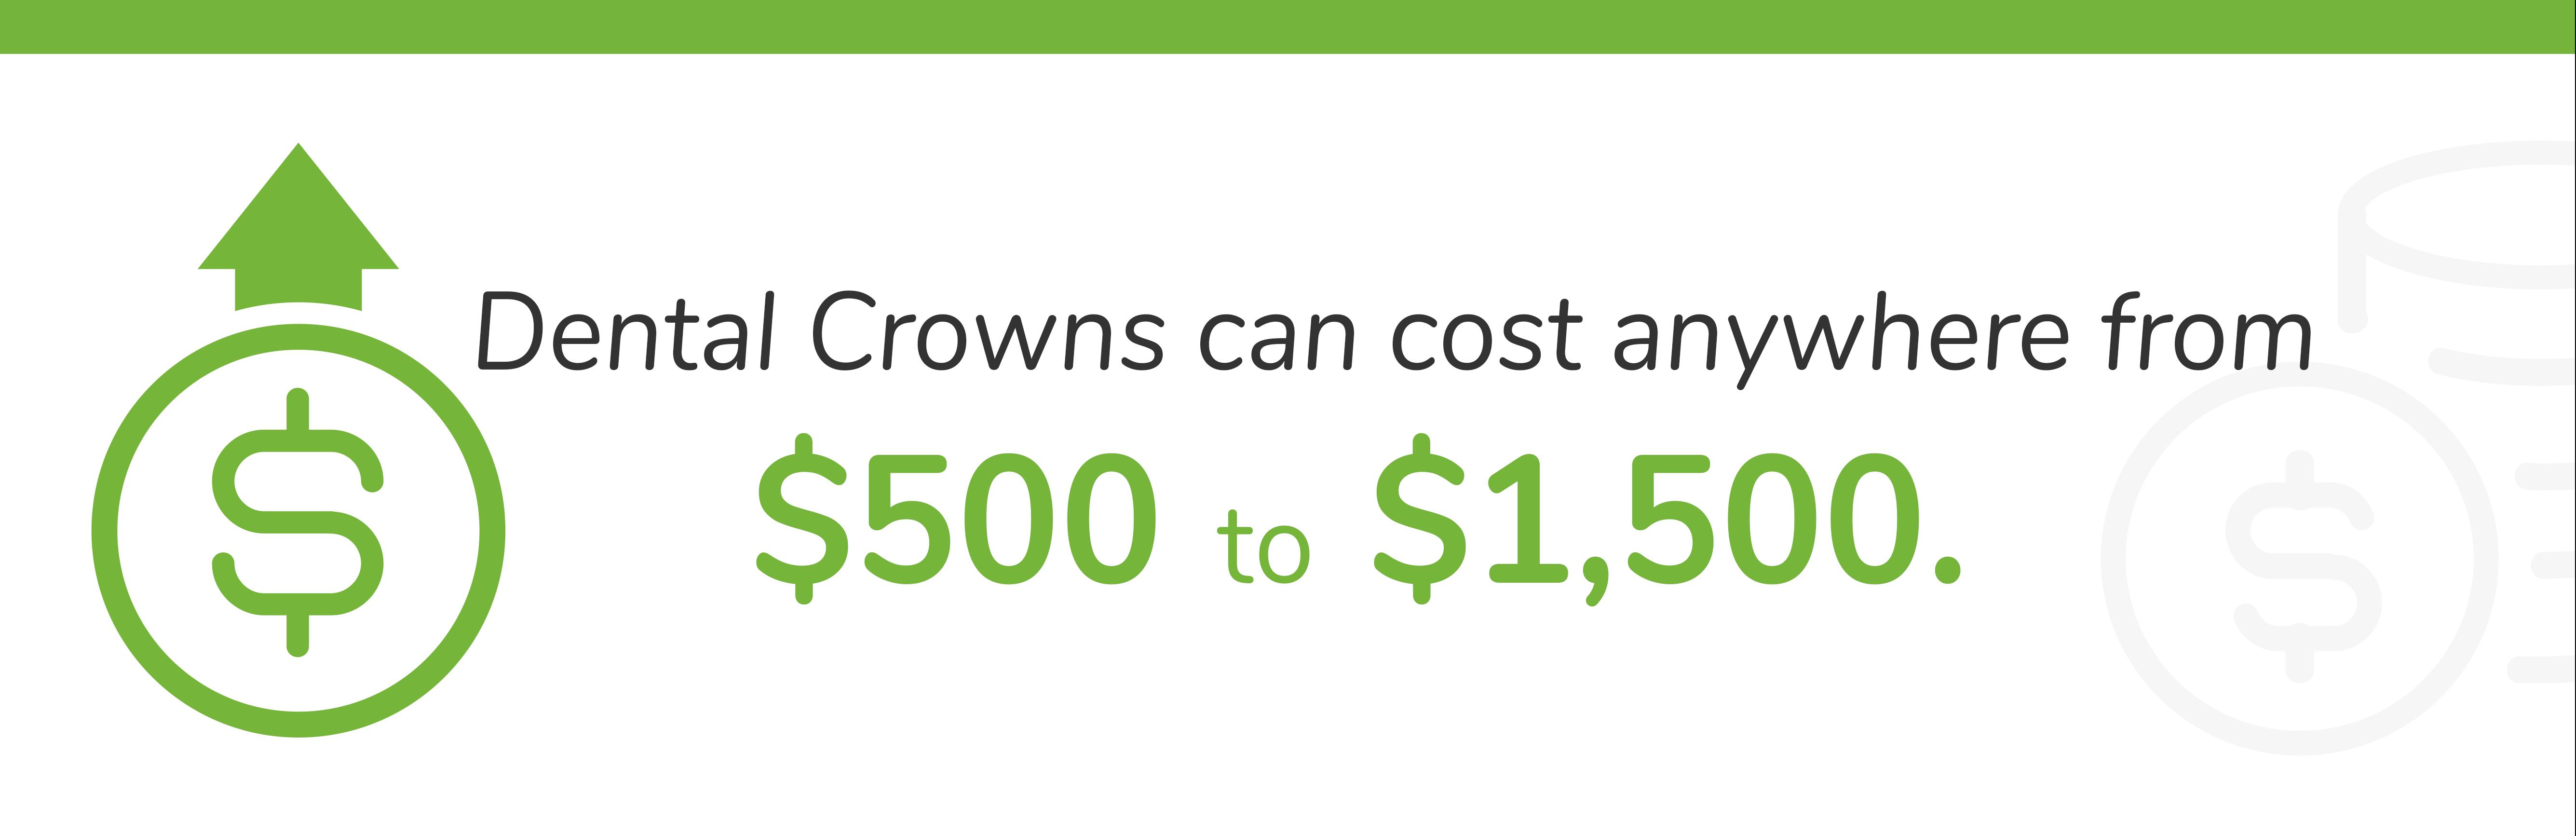 Dental Crowns Cost Range